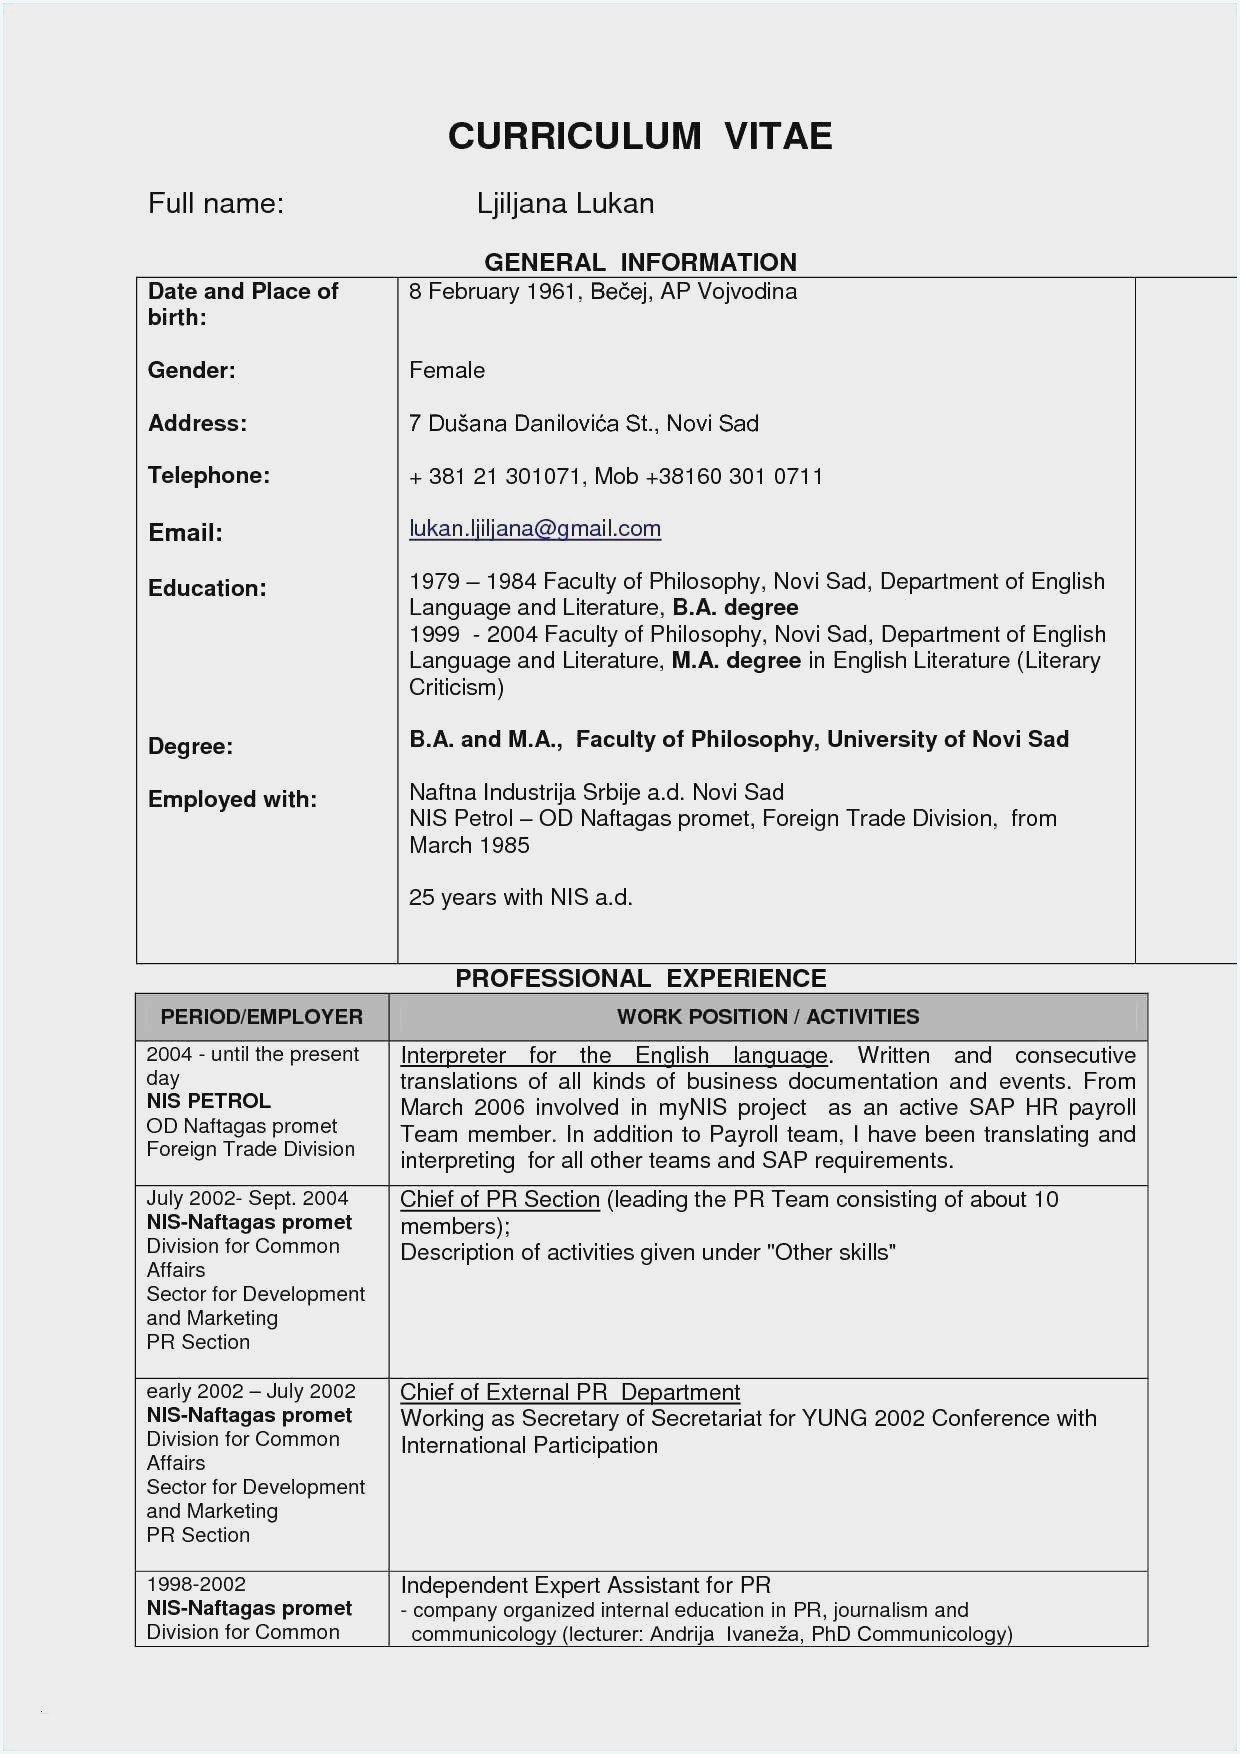 17 Automobile Fresher Resume Format Curriculum Vitae Student Resume Template Resume Examples